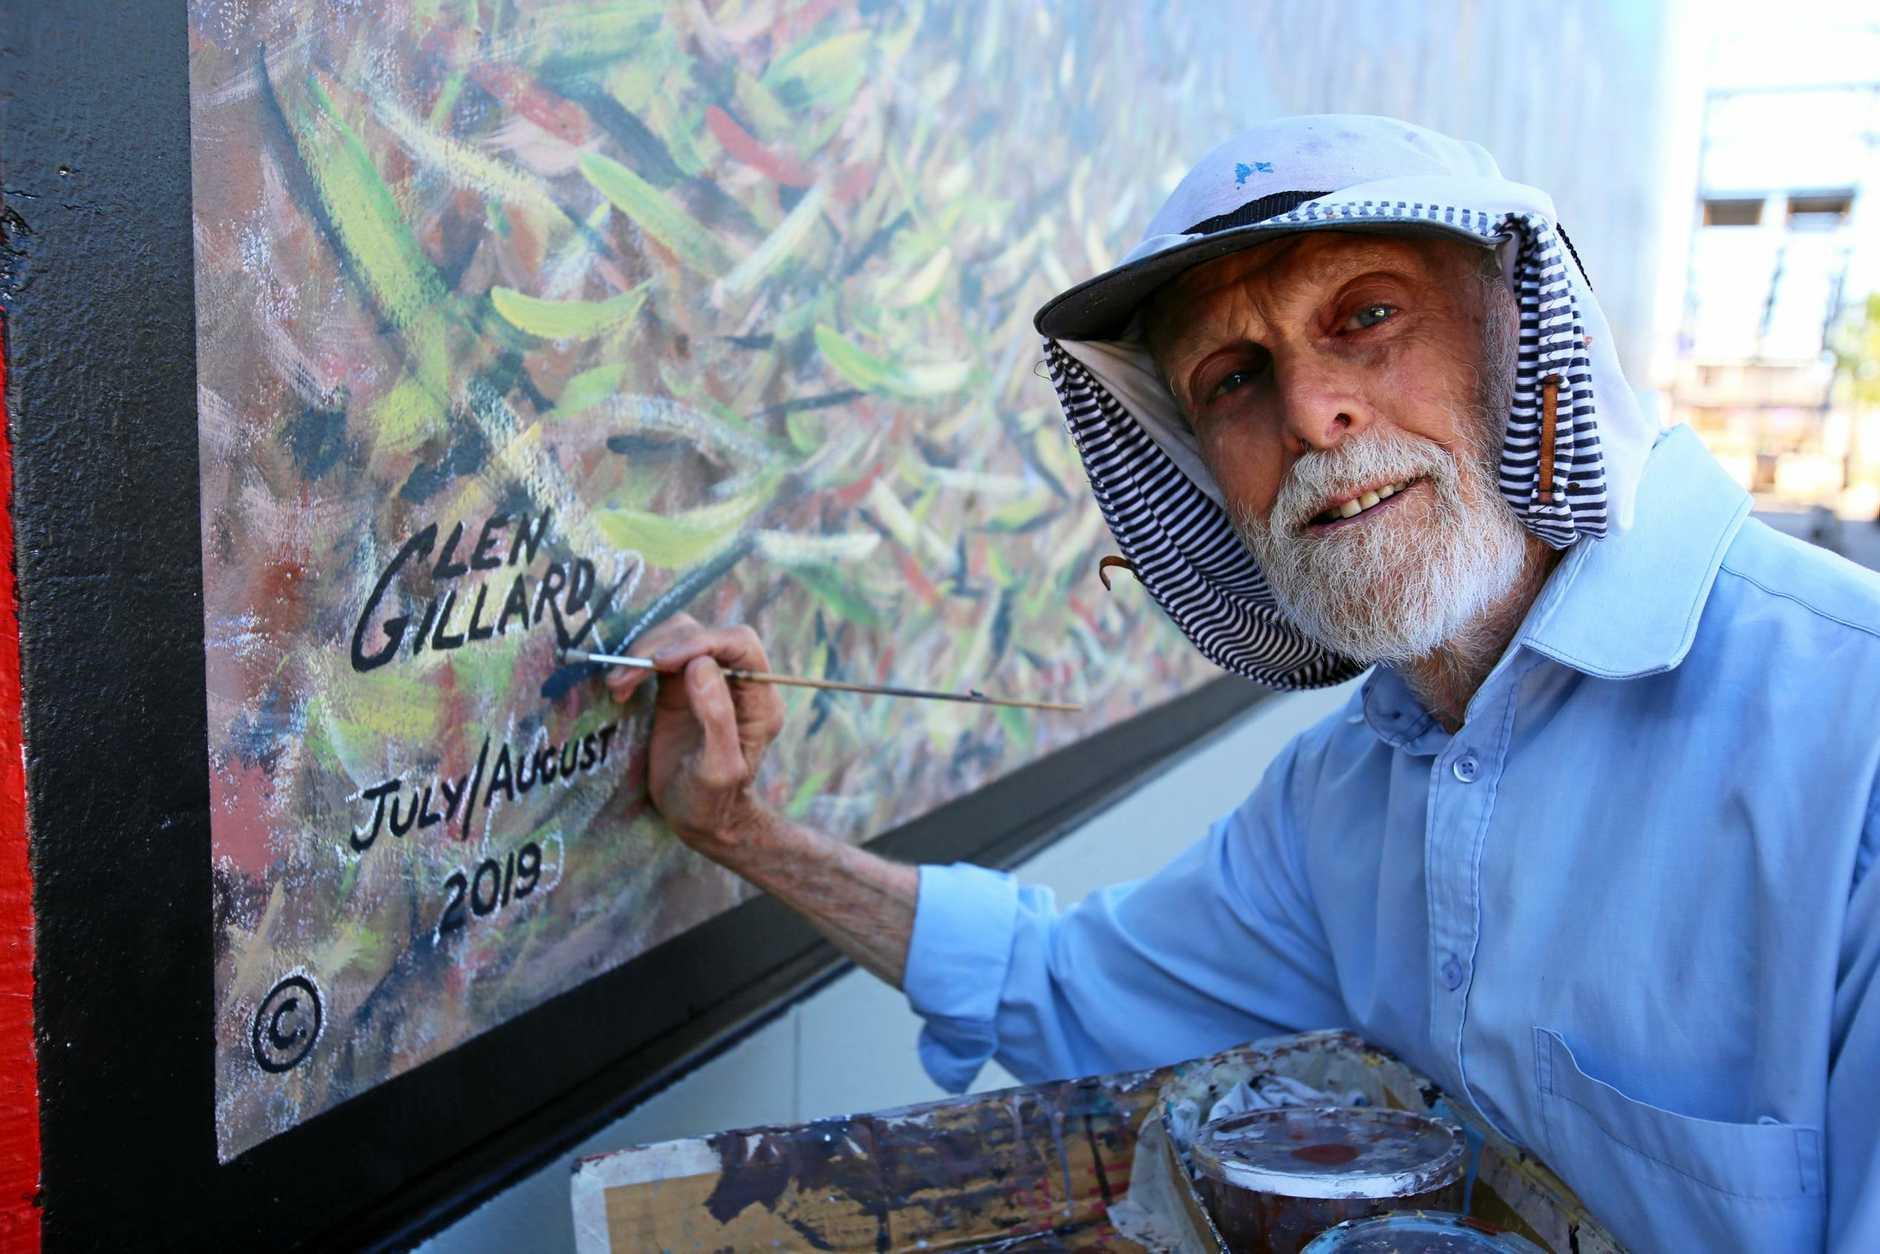 SIGNED OFF: Artist Glen Gillard signs off on his latest mural.